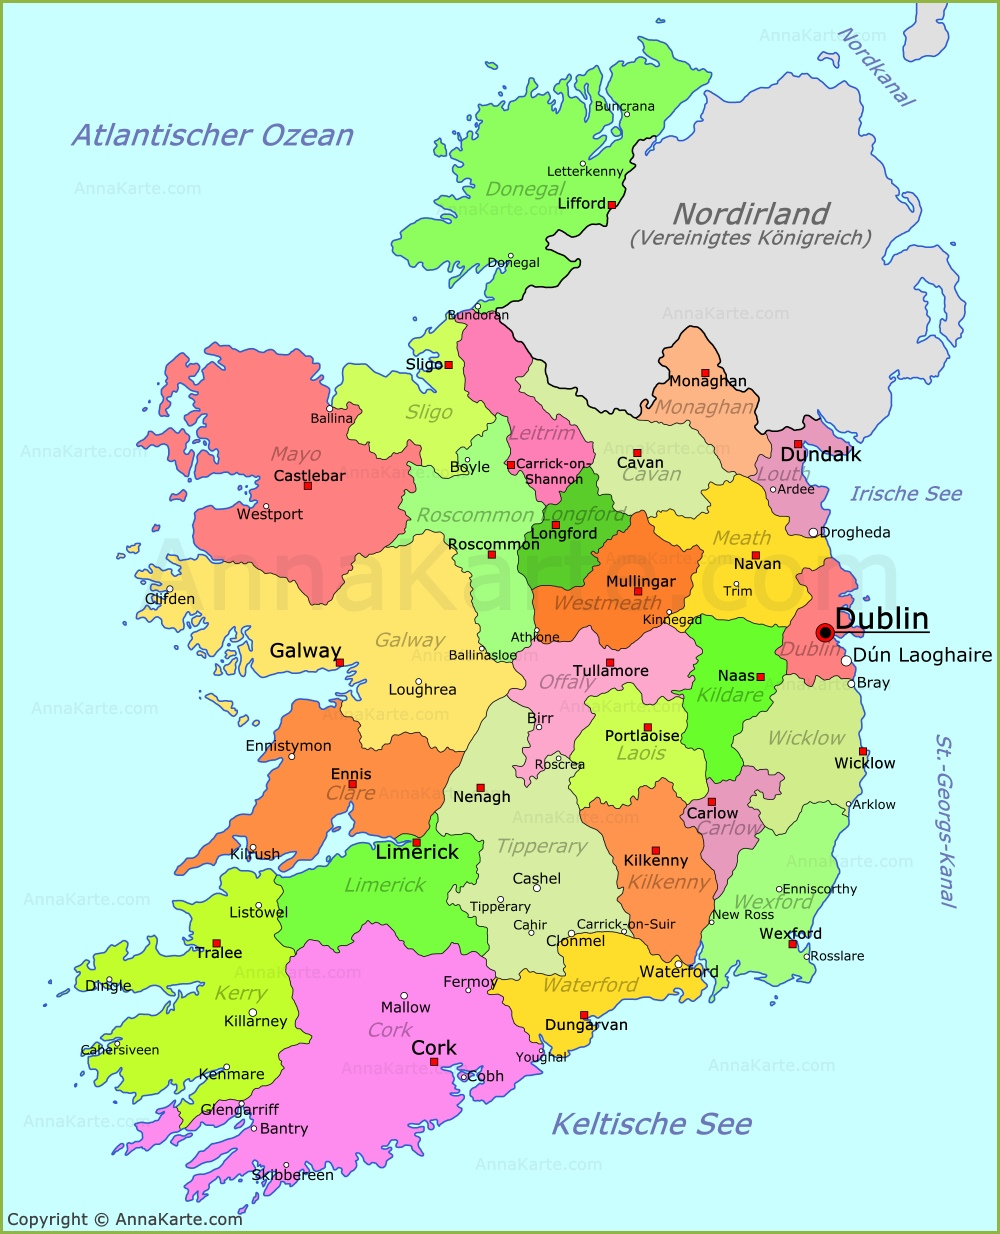 Irland Karte.Irland Karte Annakarte Com